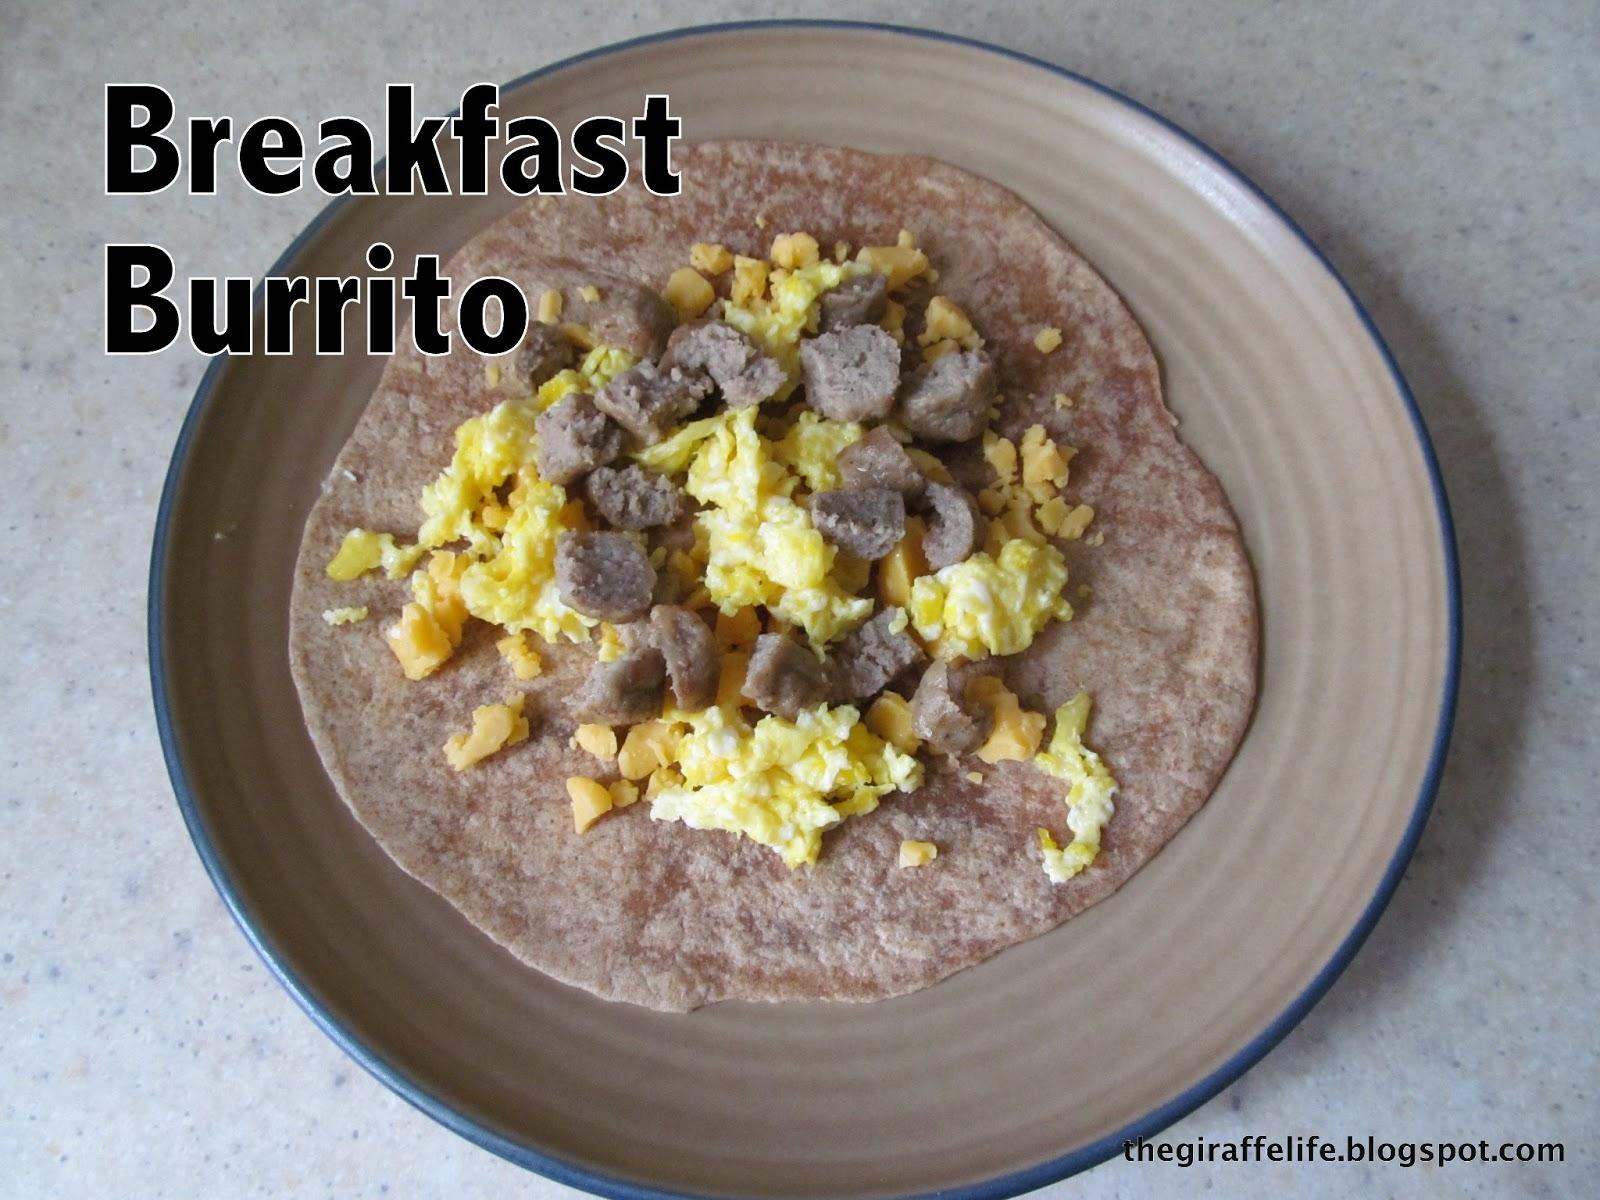 http://2.bp.blogspot.com/-2gl9ix9Pp6Q/Ucdva6gbEFI/AAAAAAAABMs/Y5z7X738un8/s1600/breakfast.JPG